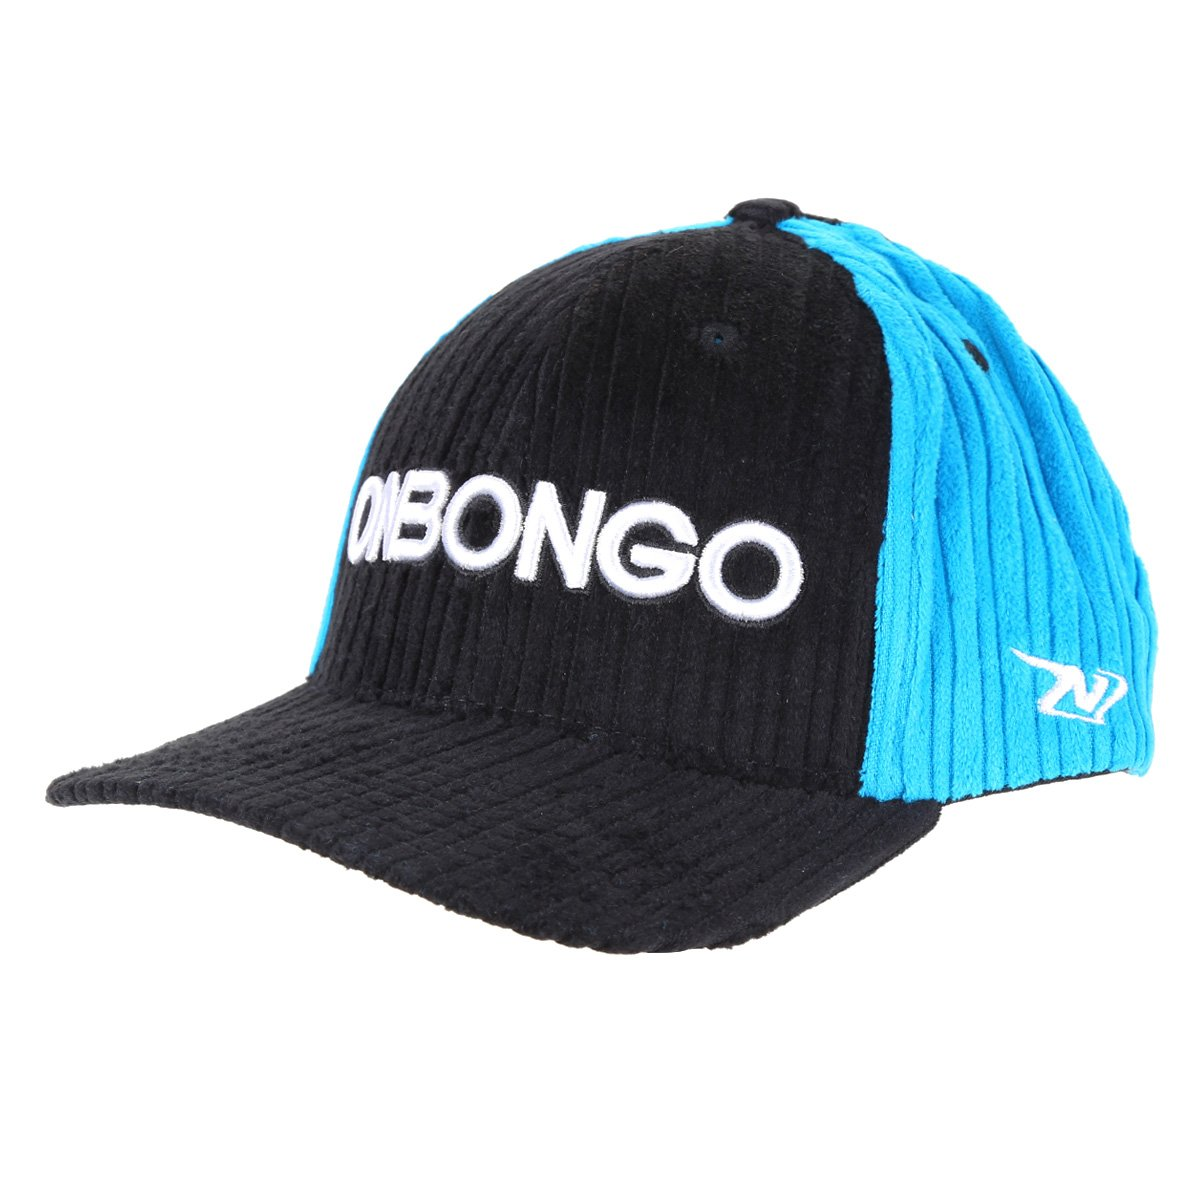 Boné Onbongo Aba Curva Snapback Colorblock Veludo